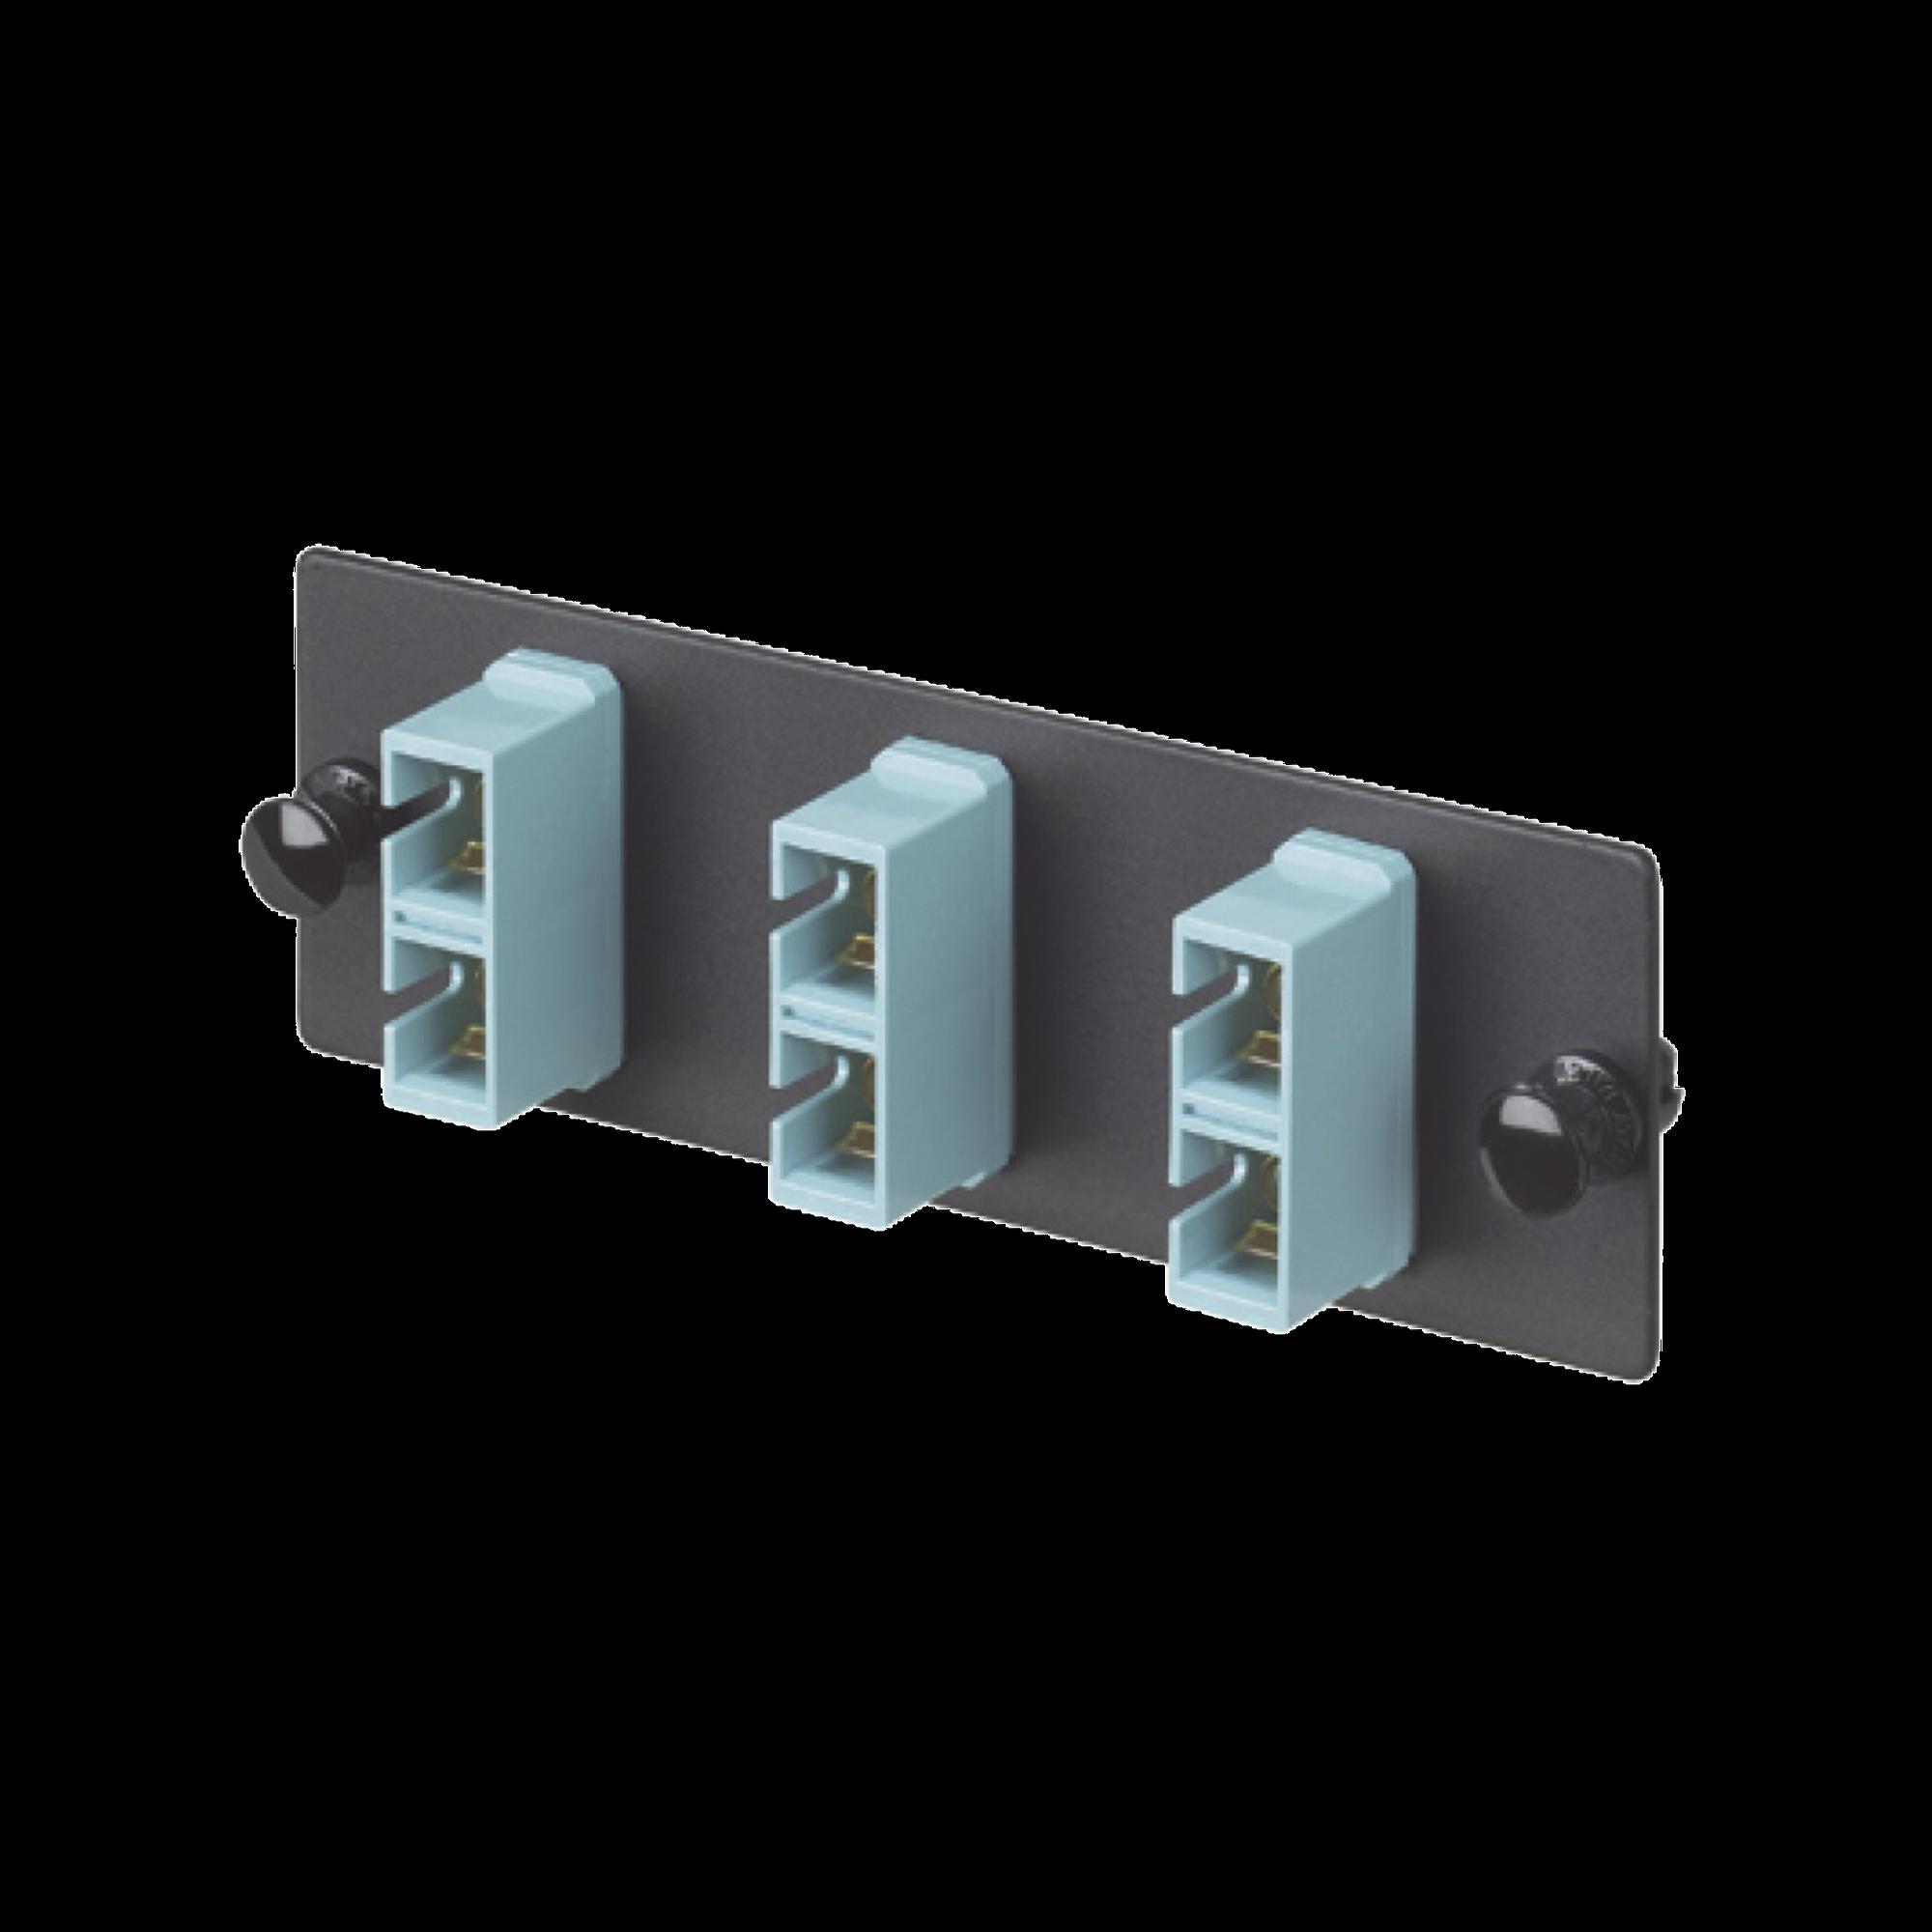 Placa Acopladora de Fibra Optica FAP, Con 3 Conectores SC Duplex (6 Fibras), Para Fibra Multimodo OM3/OM4, Color Aqua